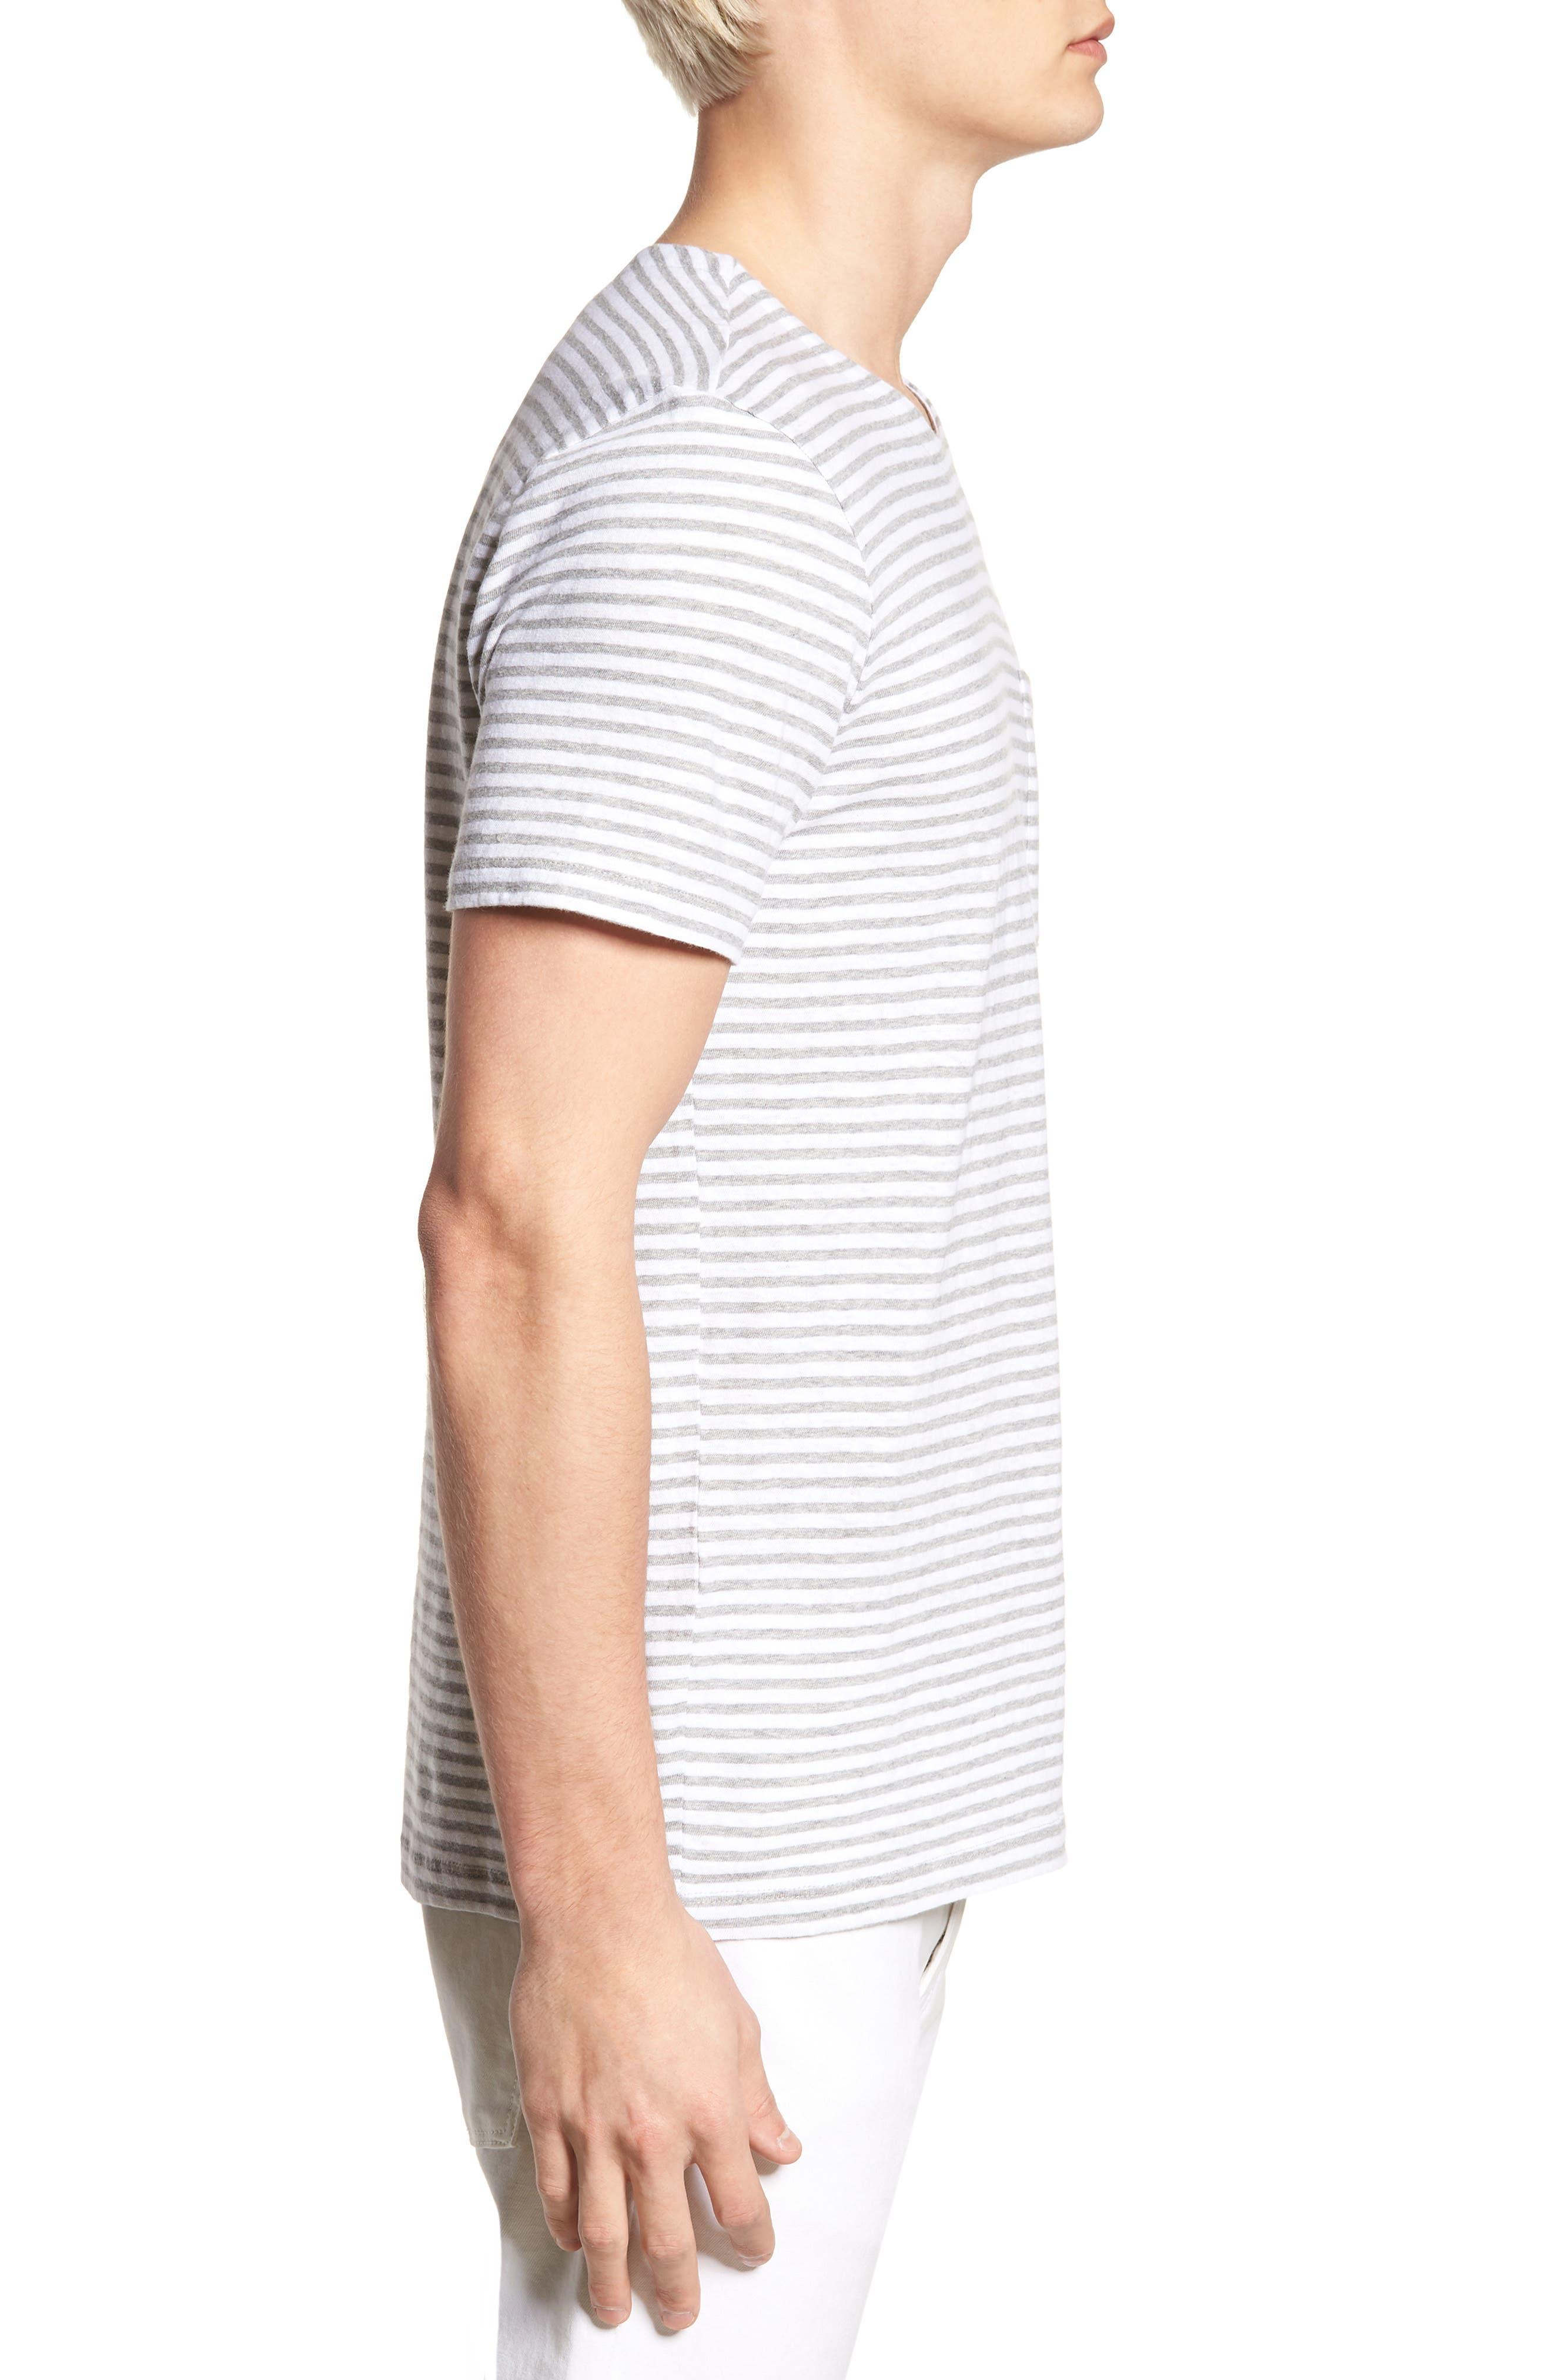 & Bros. Stripe Crewneck T-Shirt,                             Alternate thumbnail 3, color,                             White Stripe